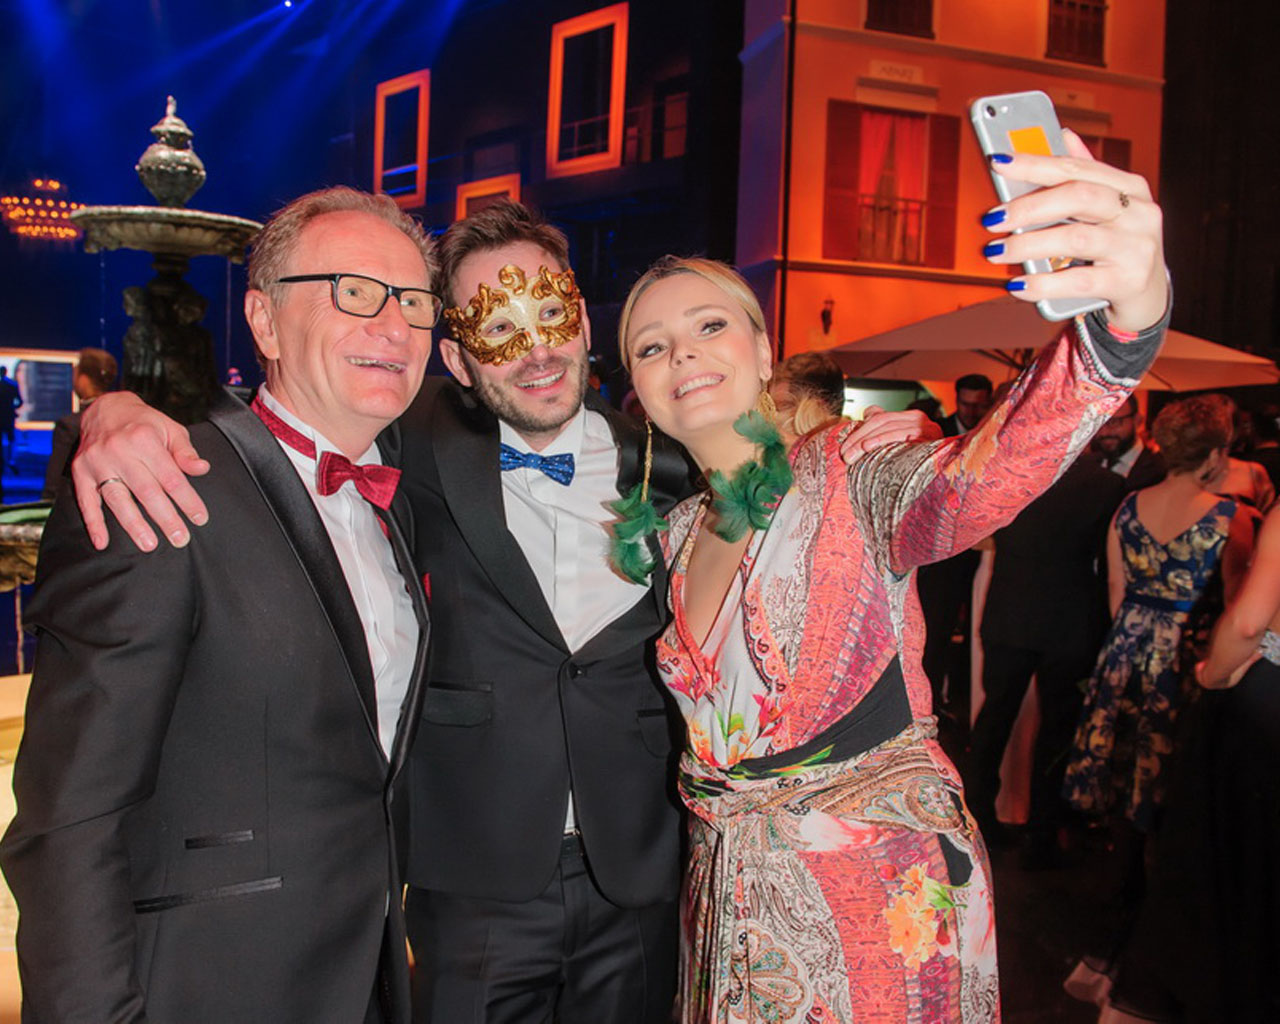 28.02.2017 Warszawa Impreza jubileuszowa 40 lat firmy APART N/z fot. Tomasz Urbanek/East News